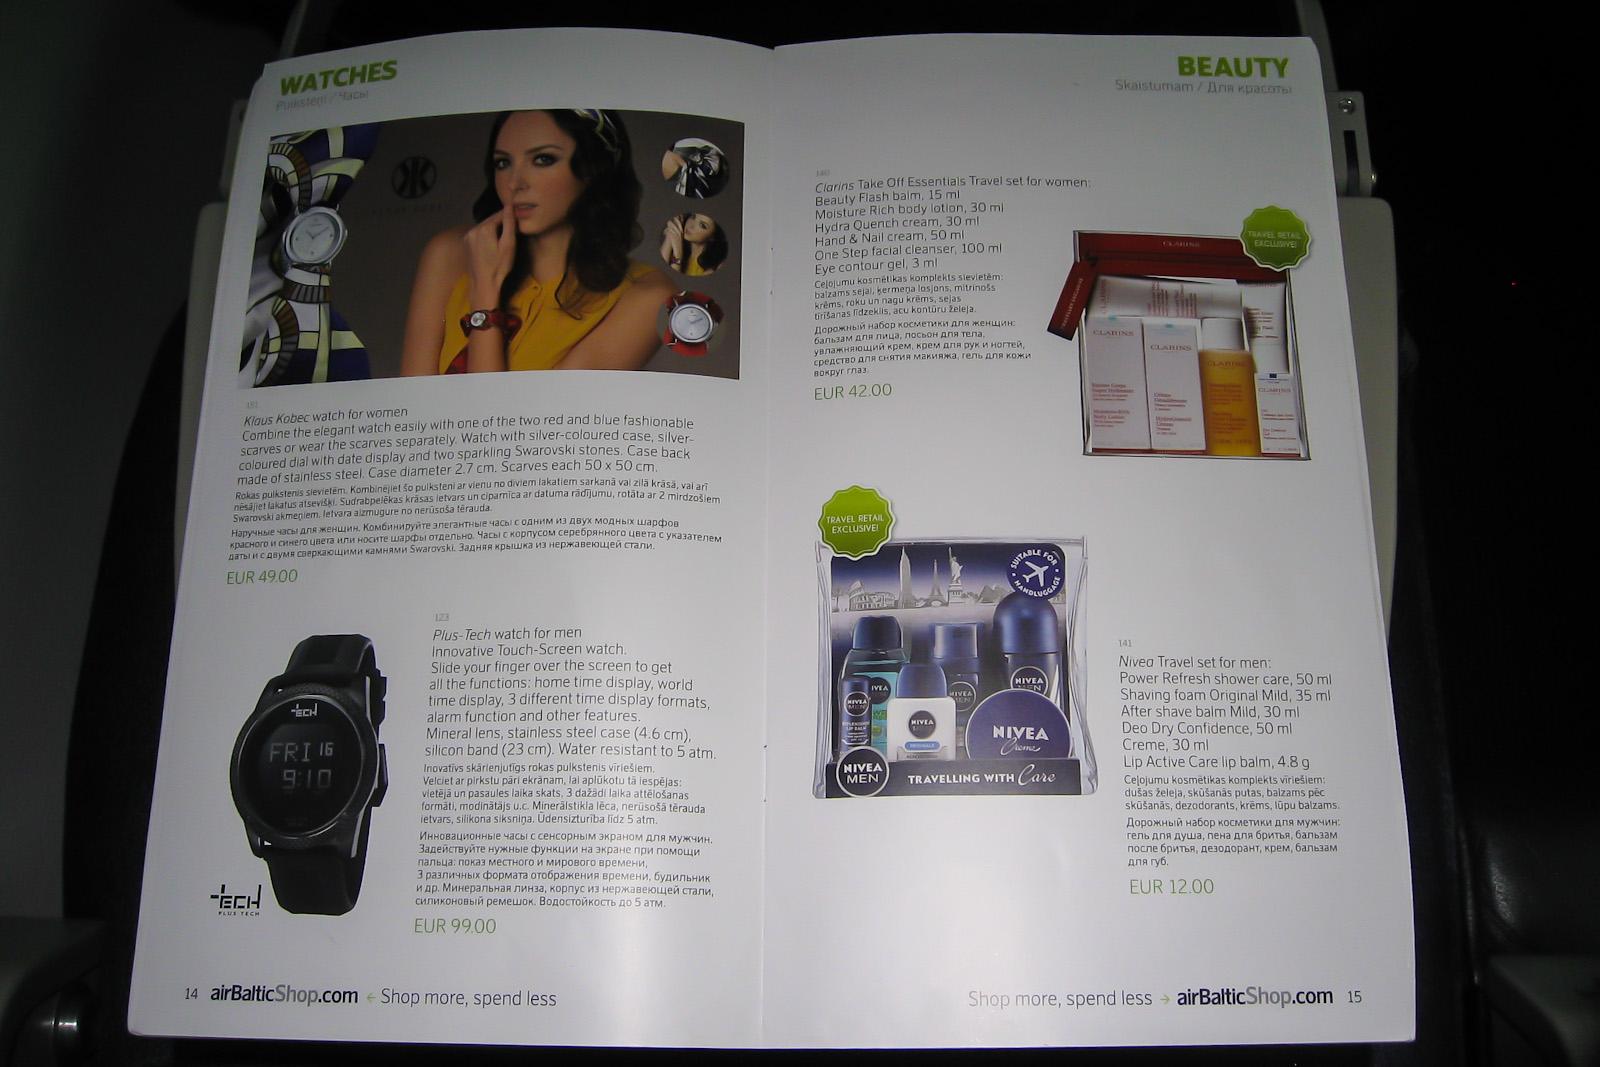 Каталог товаров авиакомпании airBaltic